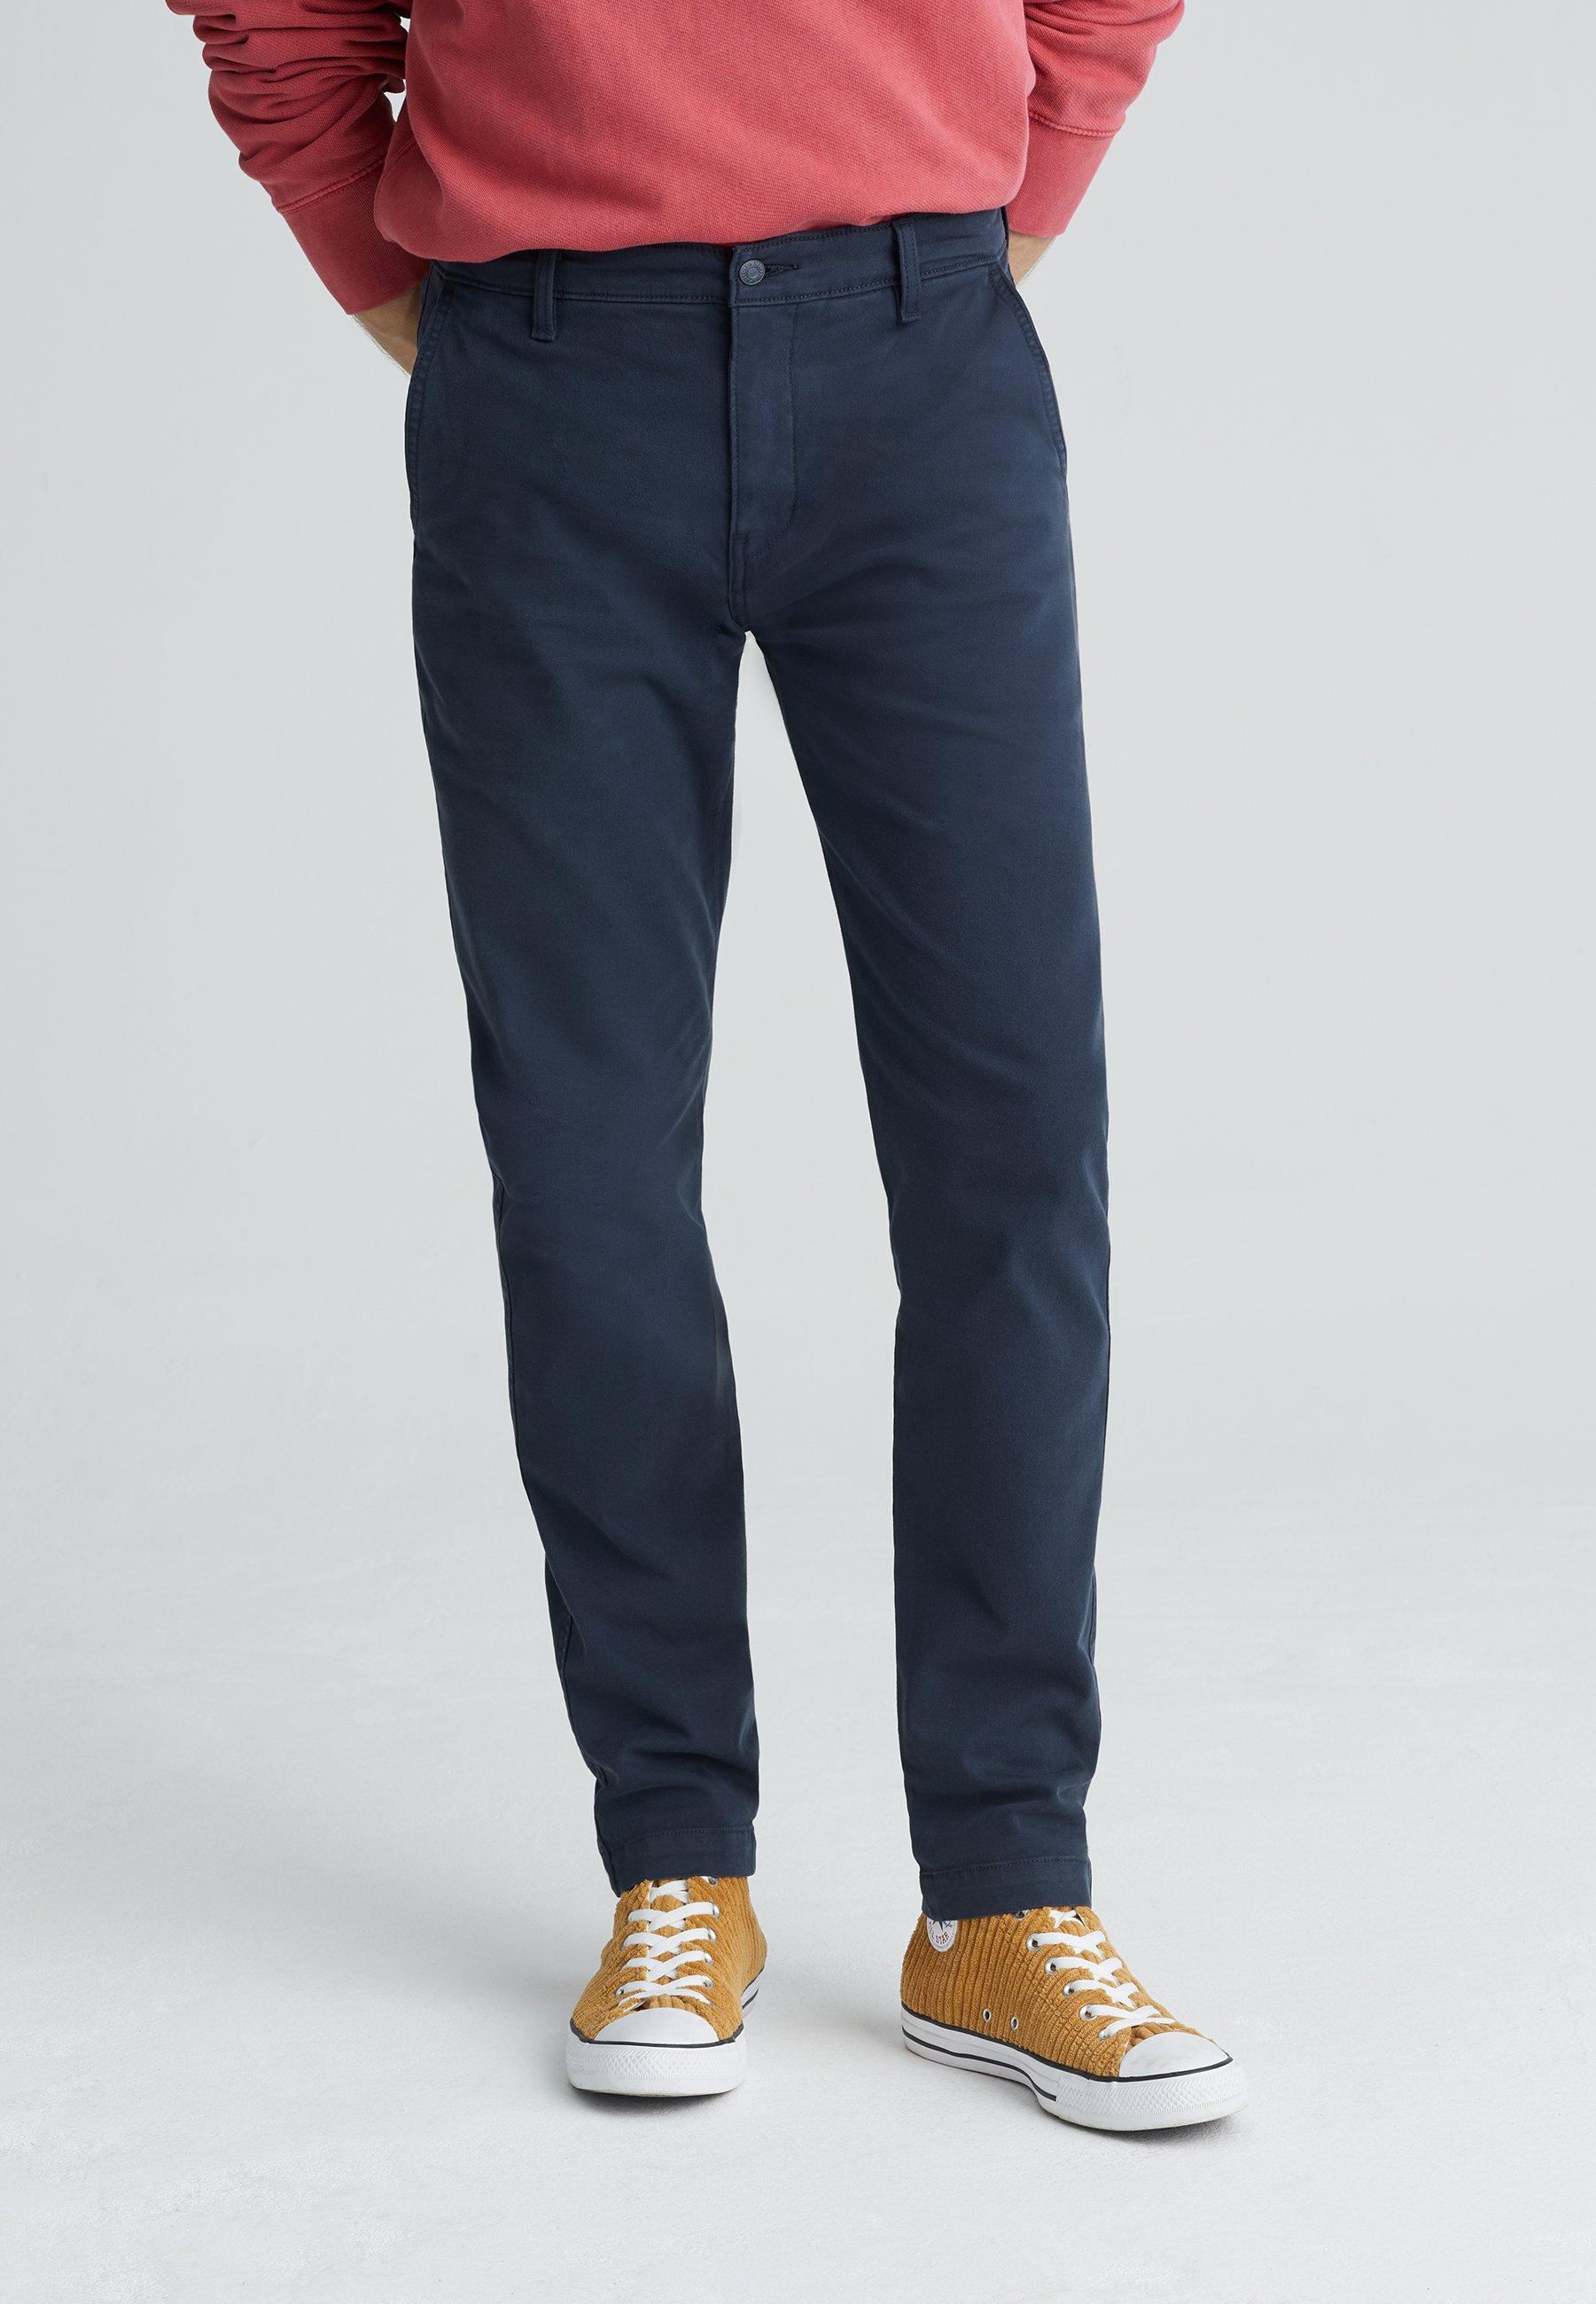 Lowest Price Limit Discount Men's Clothing Levi's® XX CHINO SLIM II Chinos baltic navy shady msiXdxDbL wxepFXei1